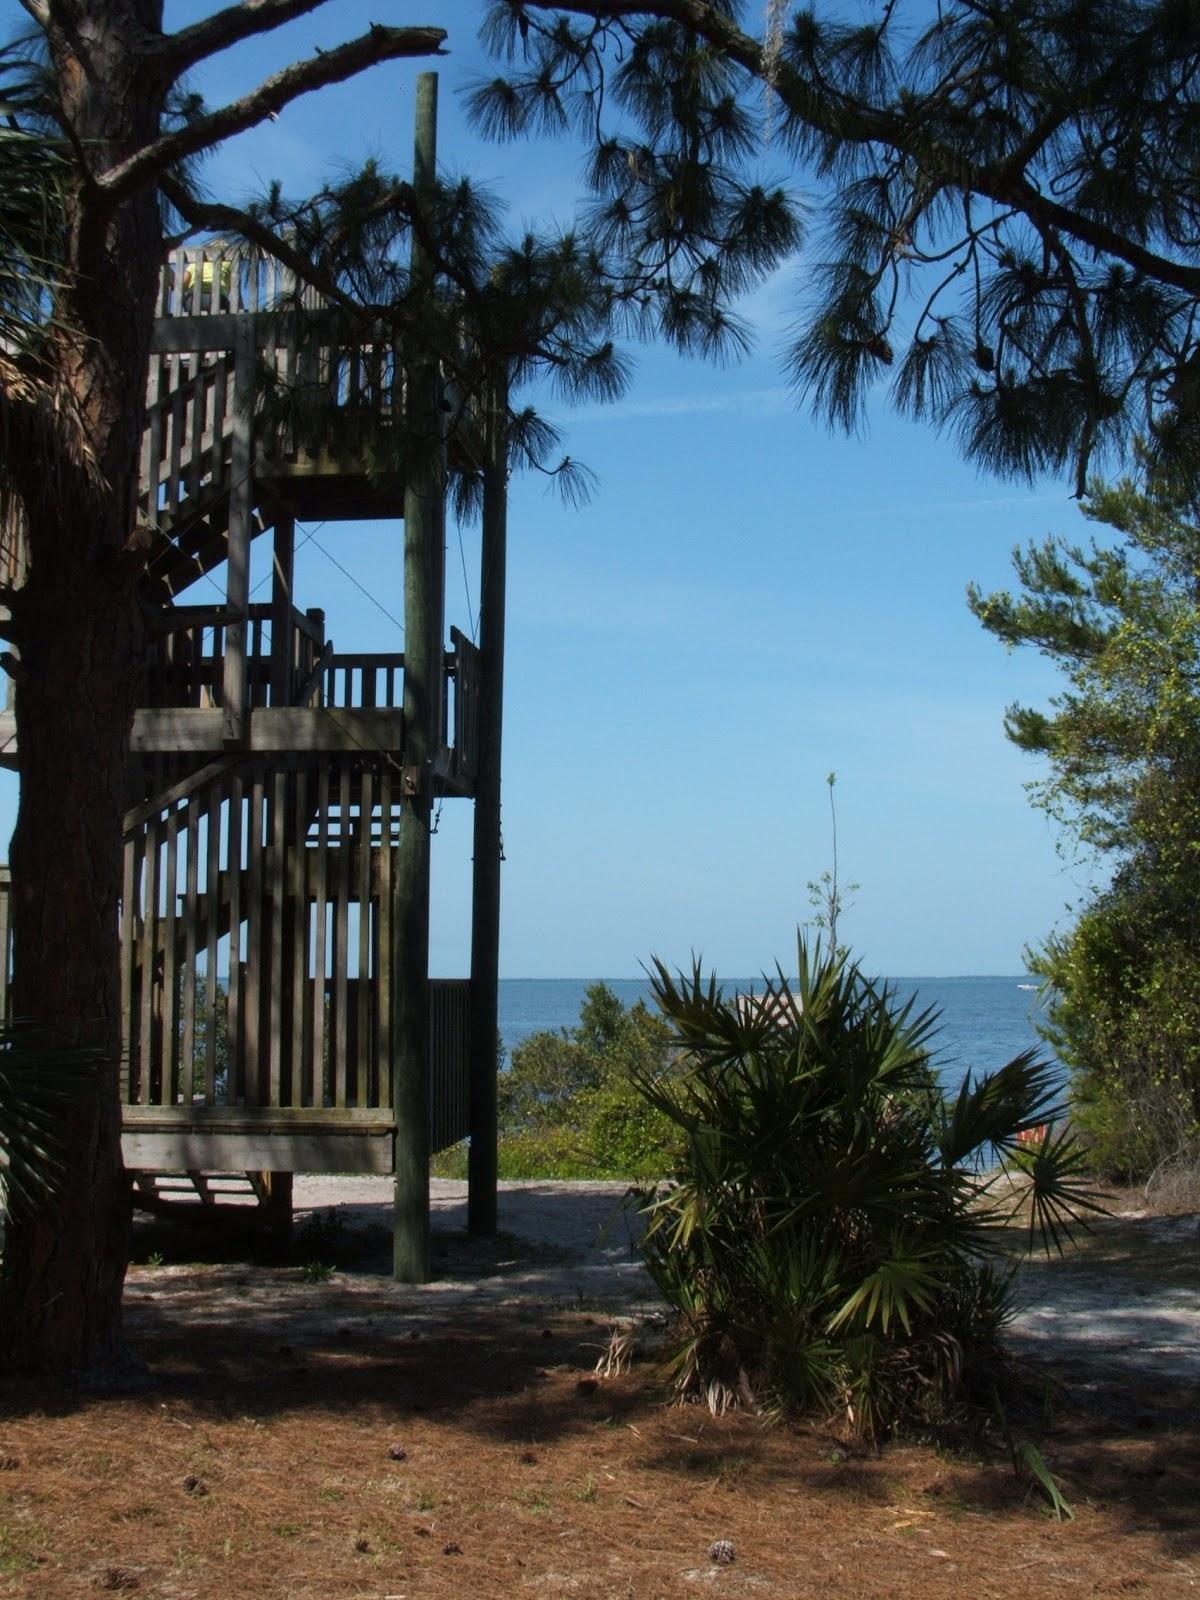 A Hikers Driving Tour: Tampa Bay Circle Eco-Tour